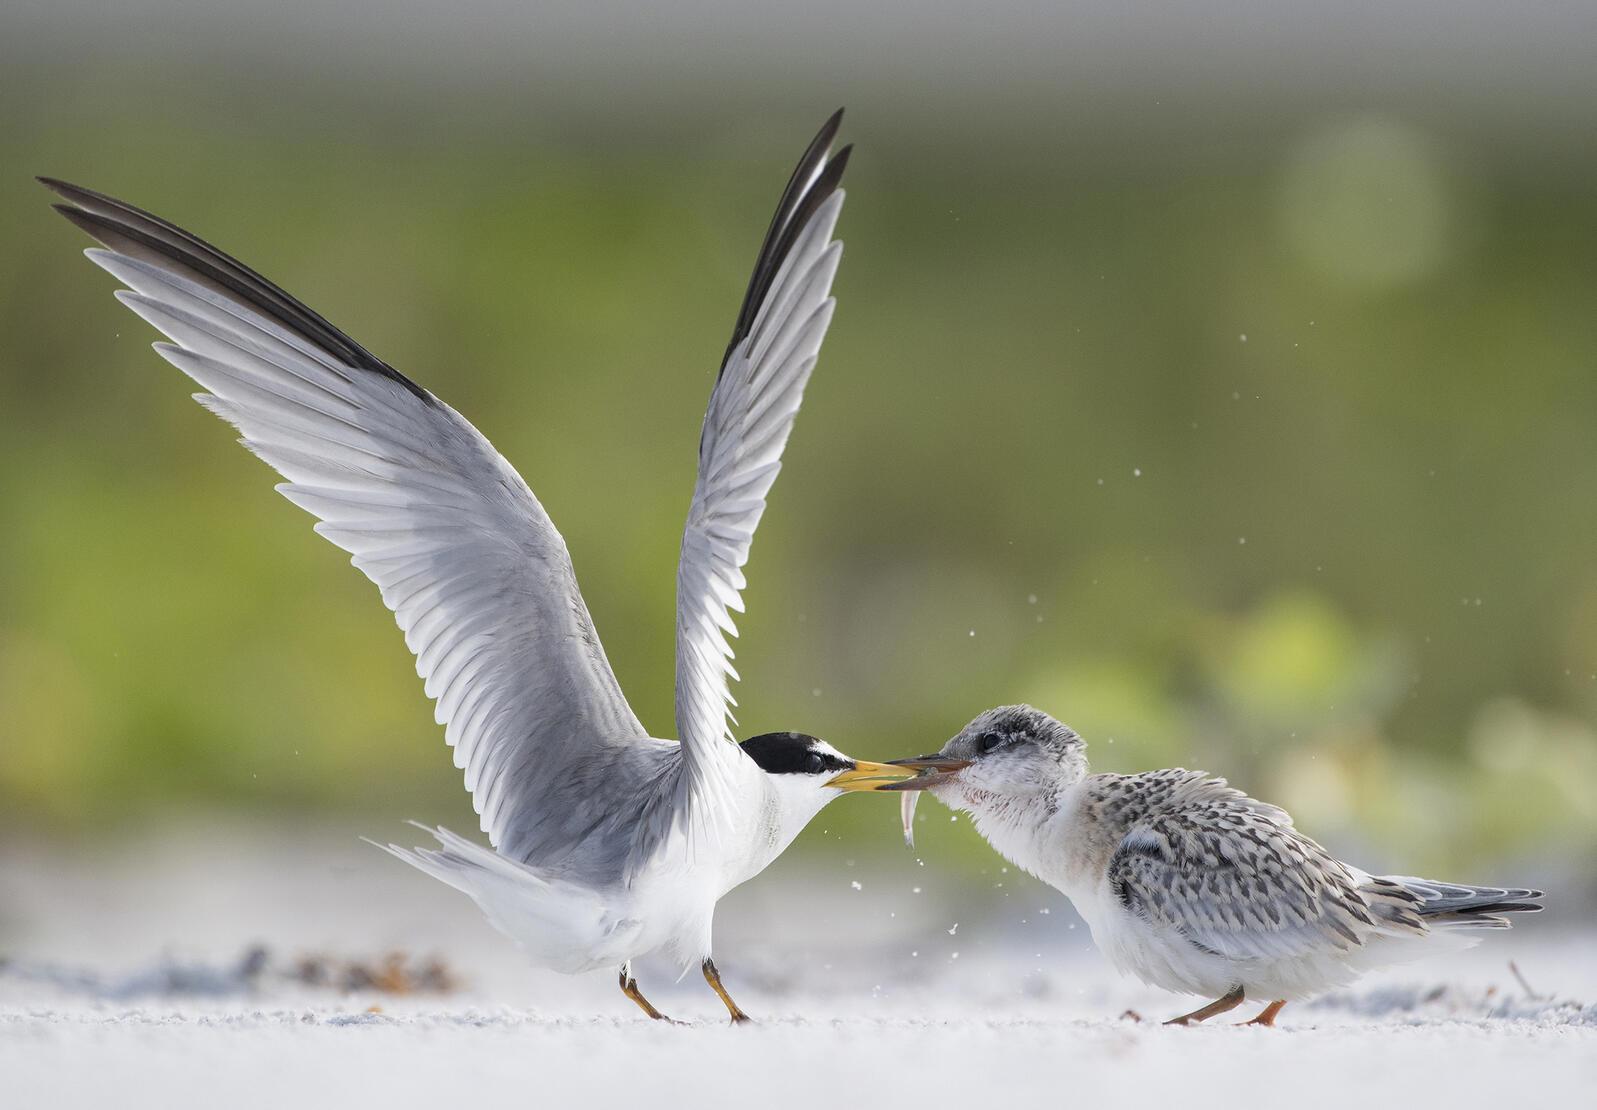 Anja Trepper/Audubon Photography Awards